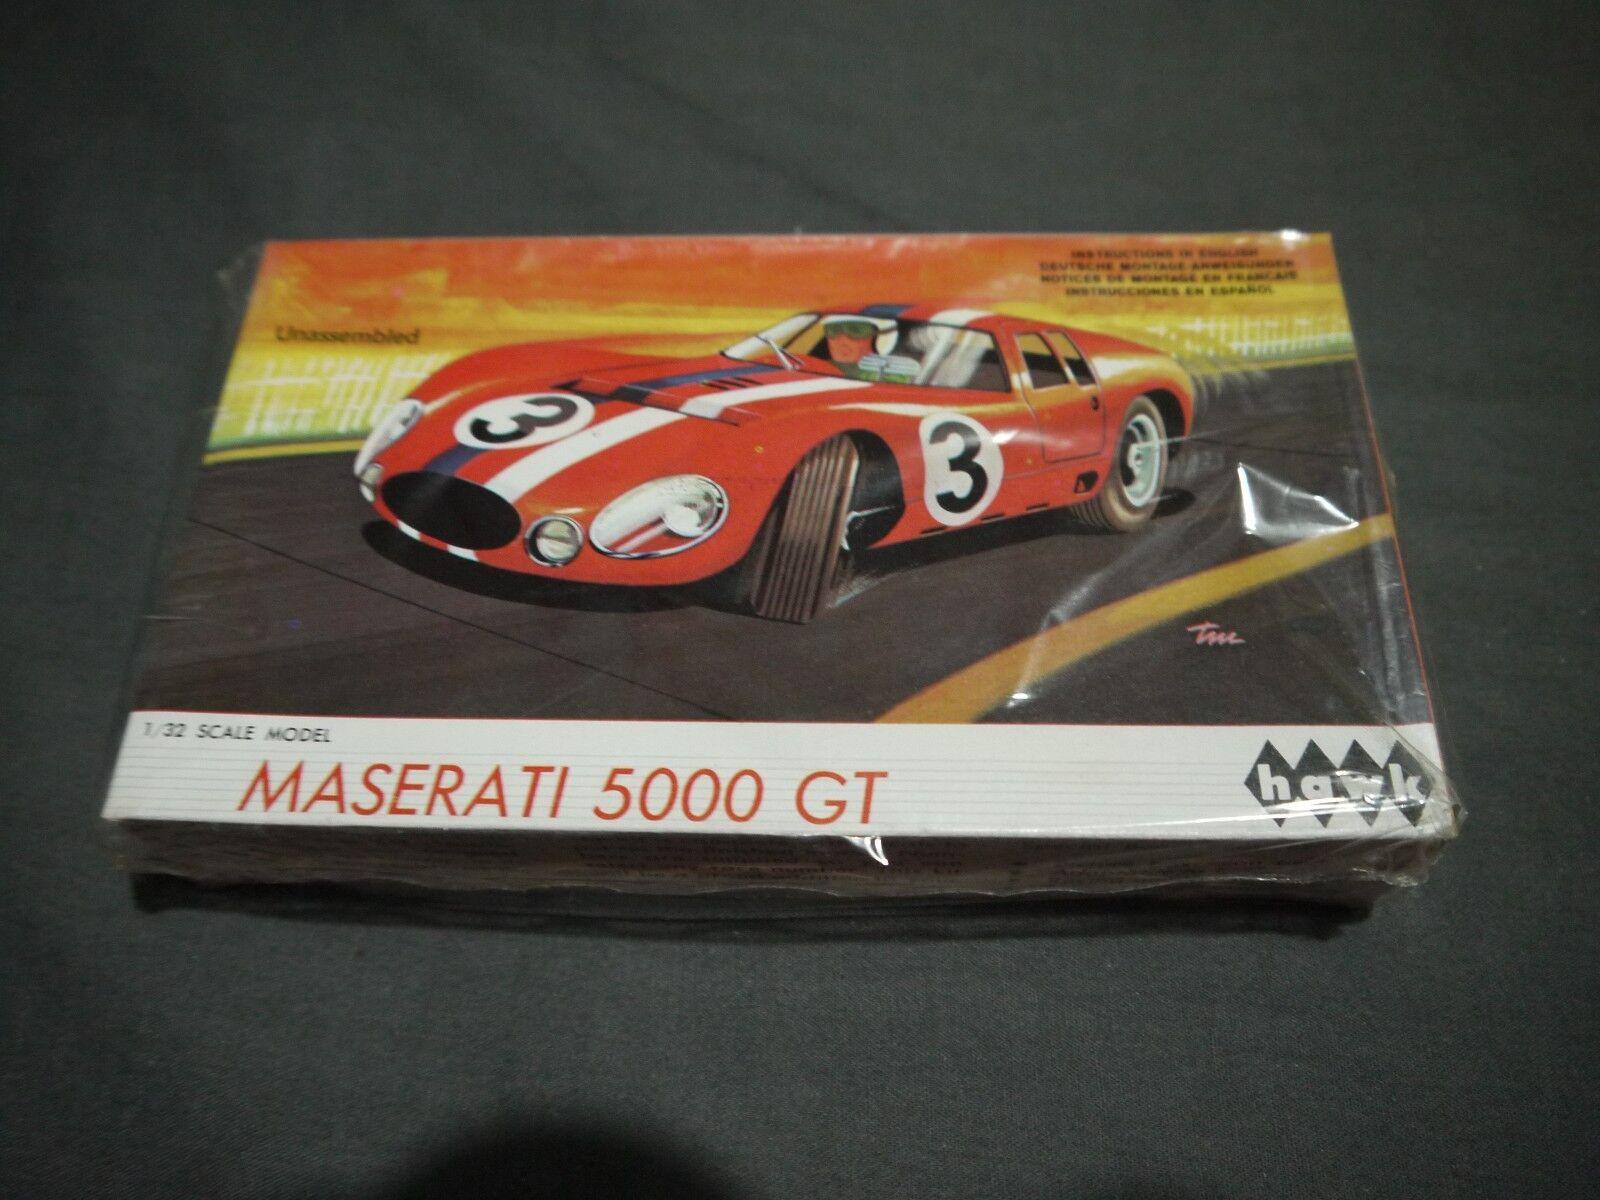 RARE HAWK MASERATI 5000 GT (1965) MODEL NO 4 MODEL KIT